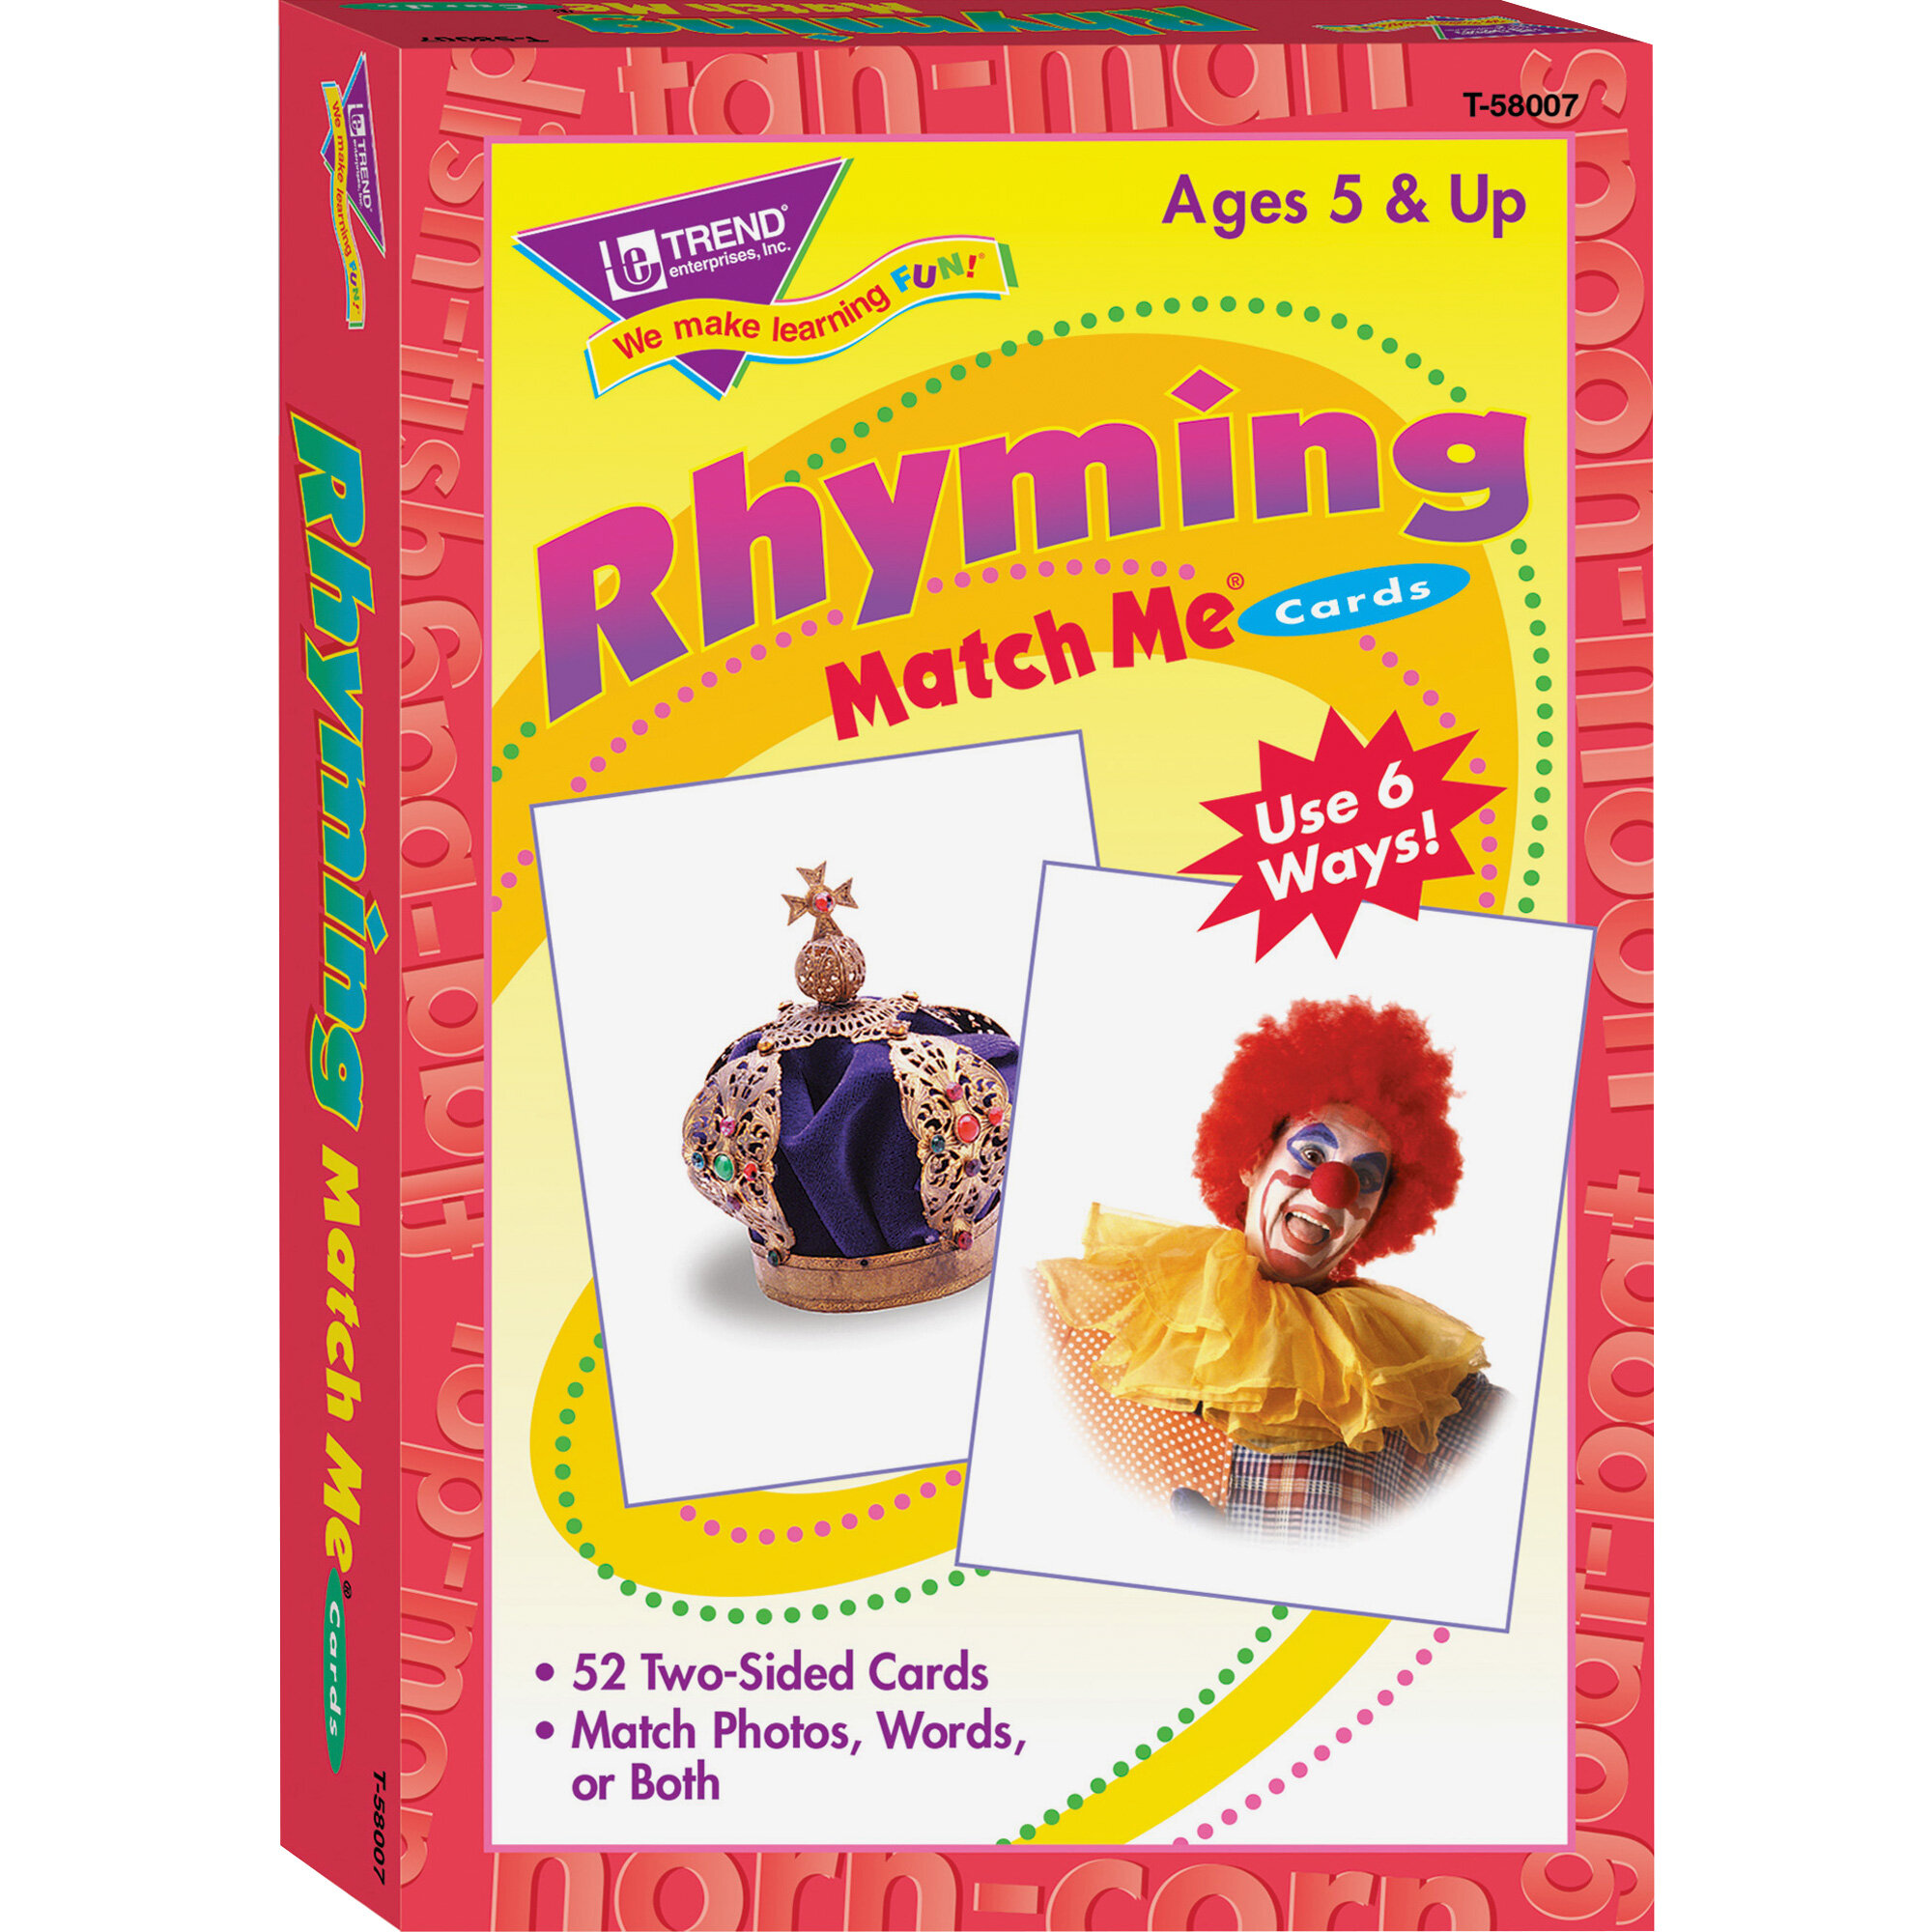 Alphabet Match Me Flash Cards